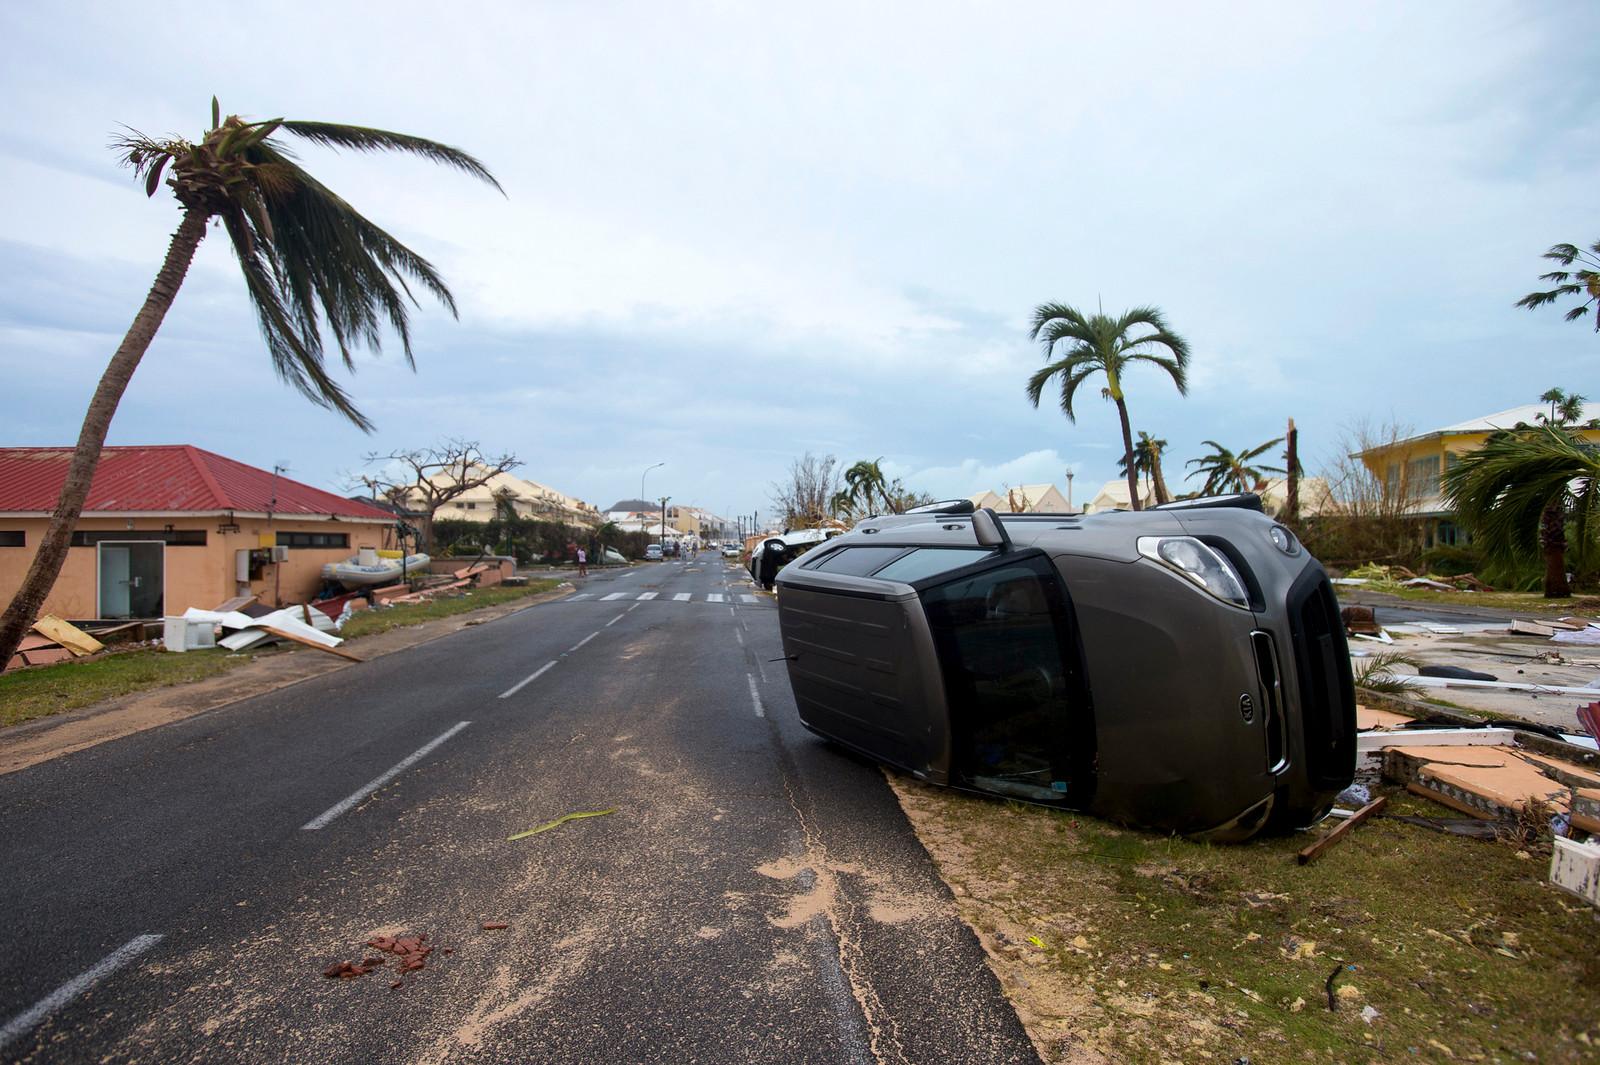 Atlantic hurricane season lasts from June 1 - Nov. 30